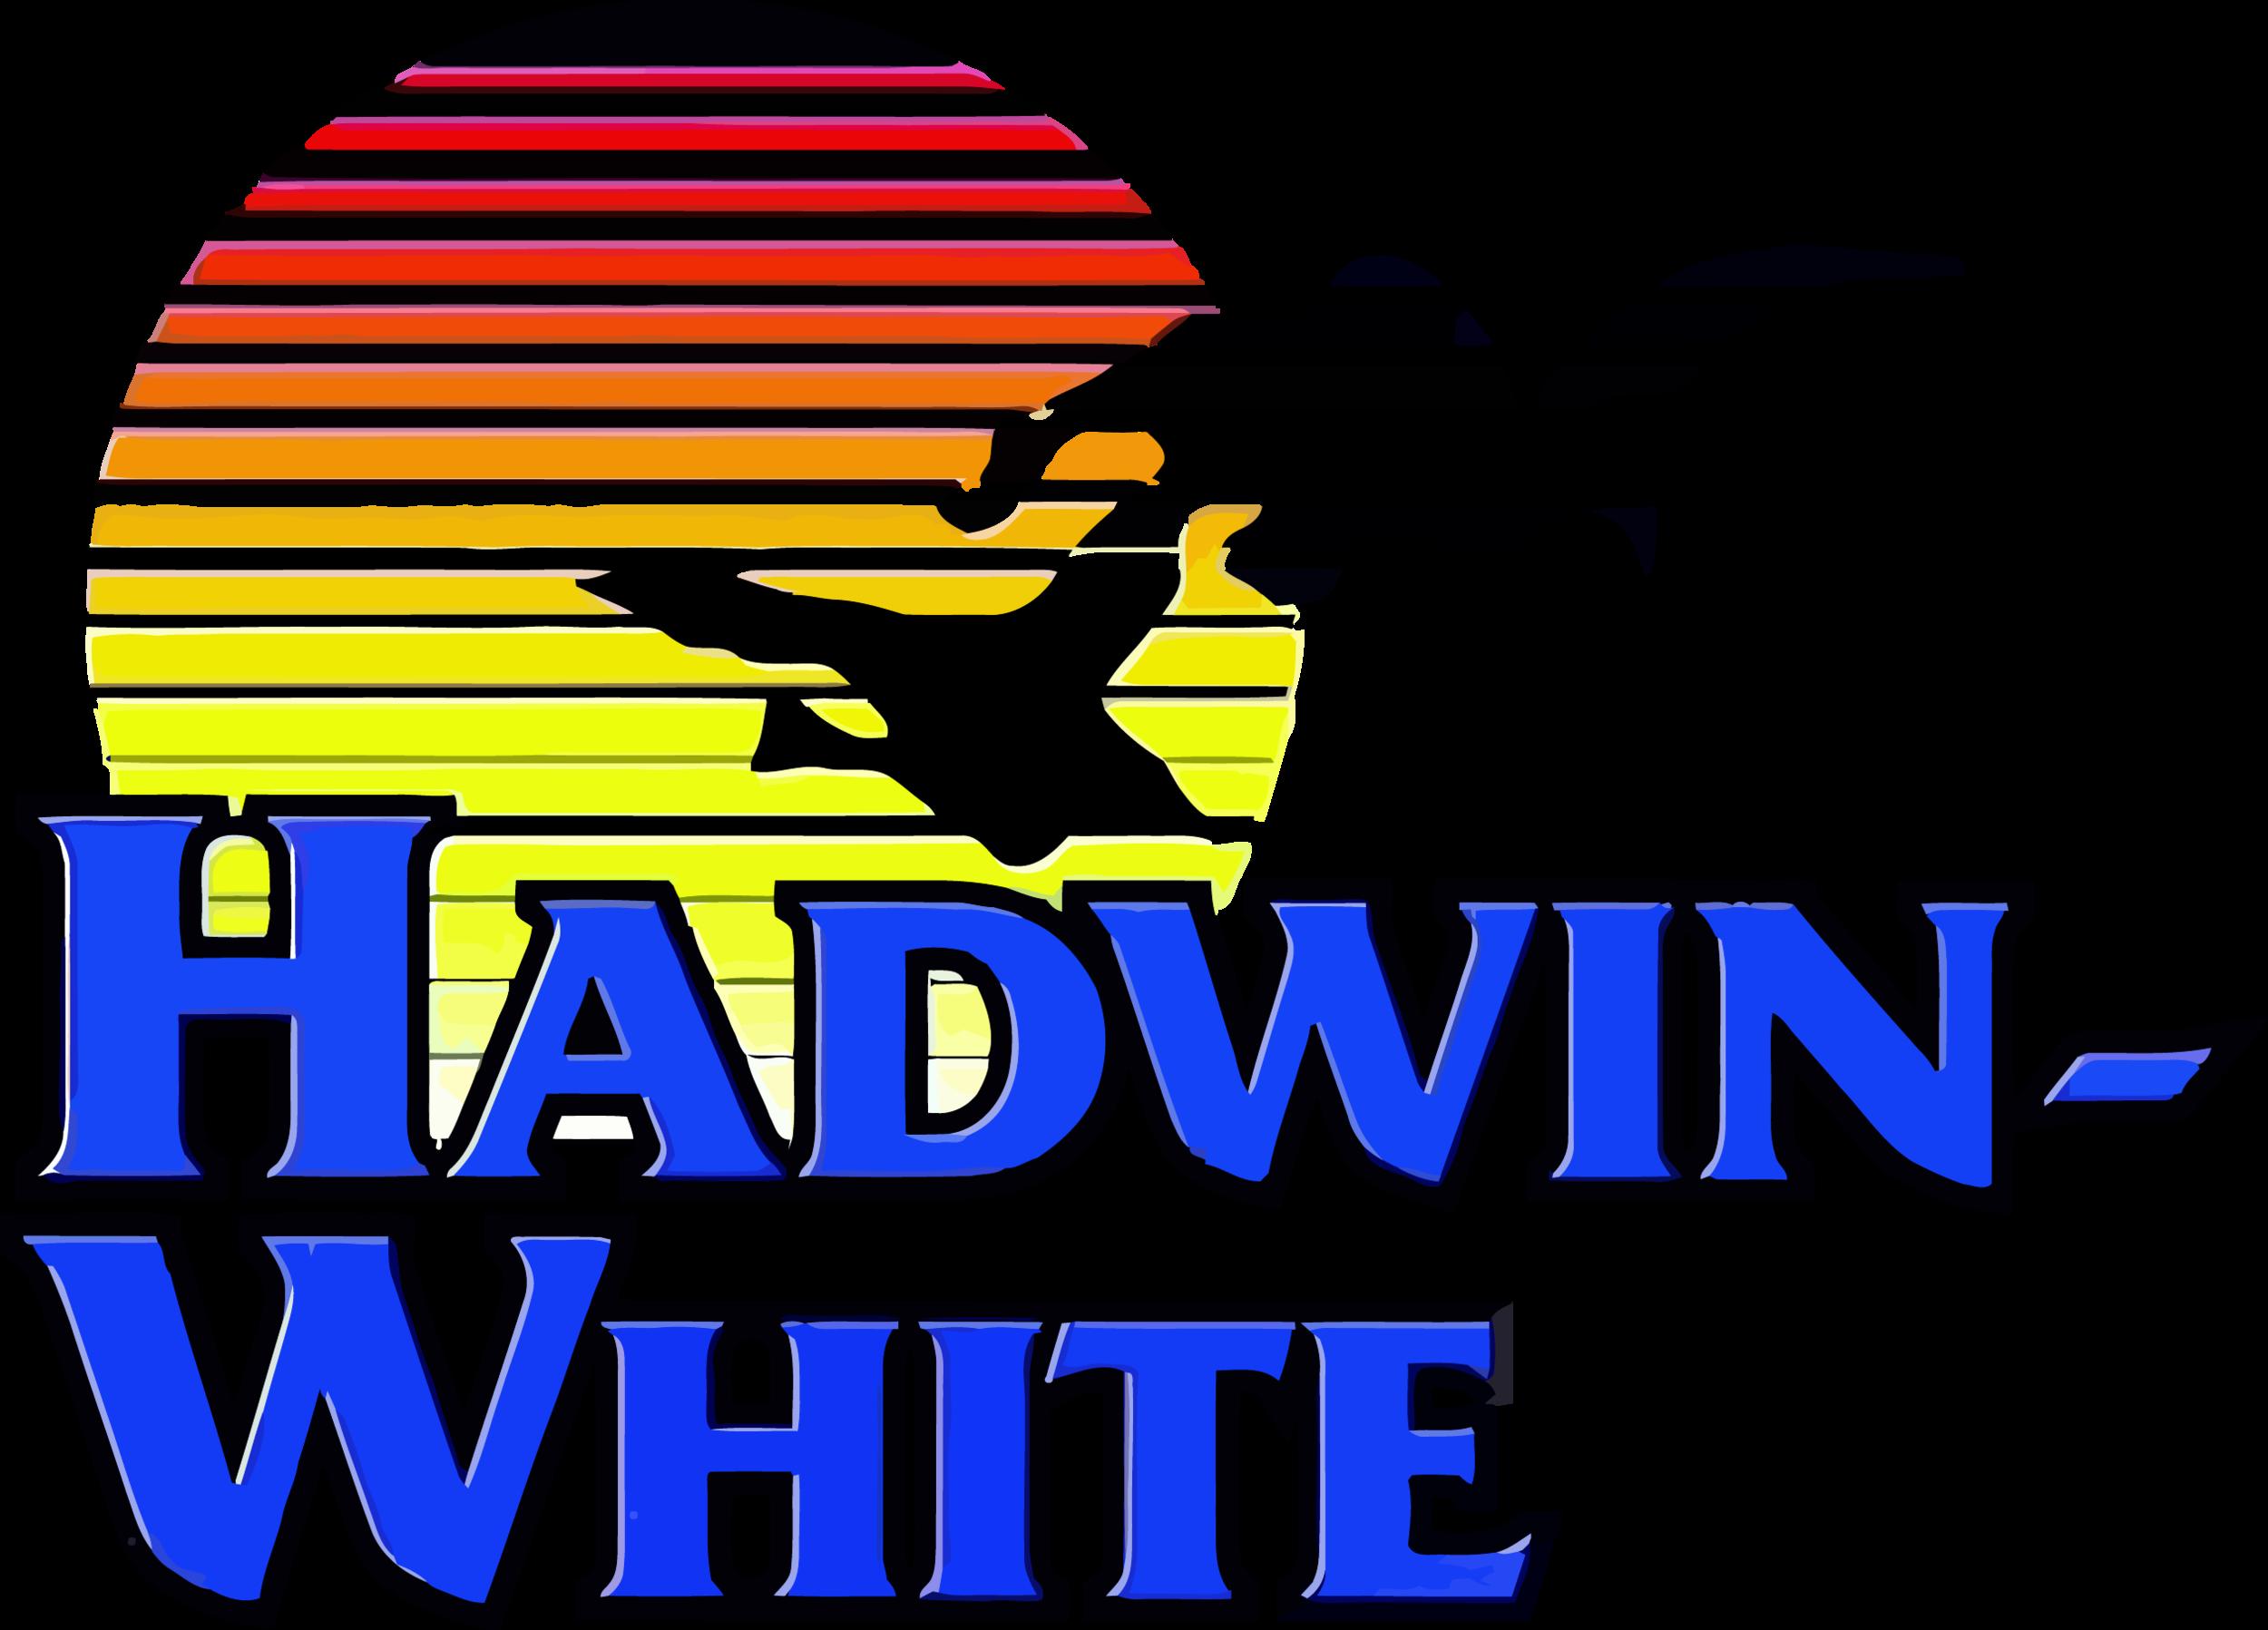 Hadwin-White.png